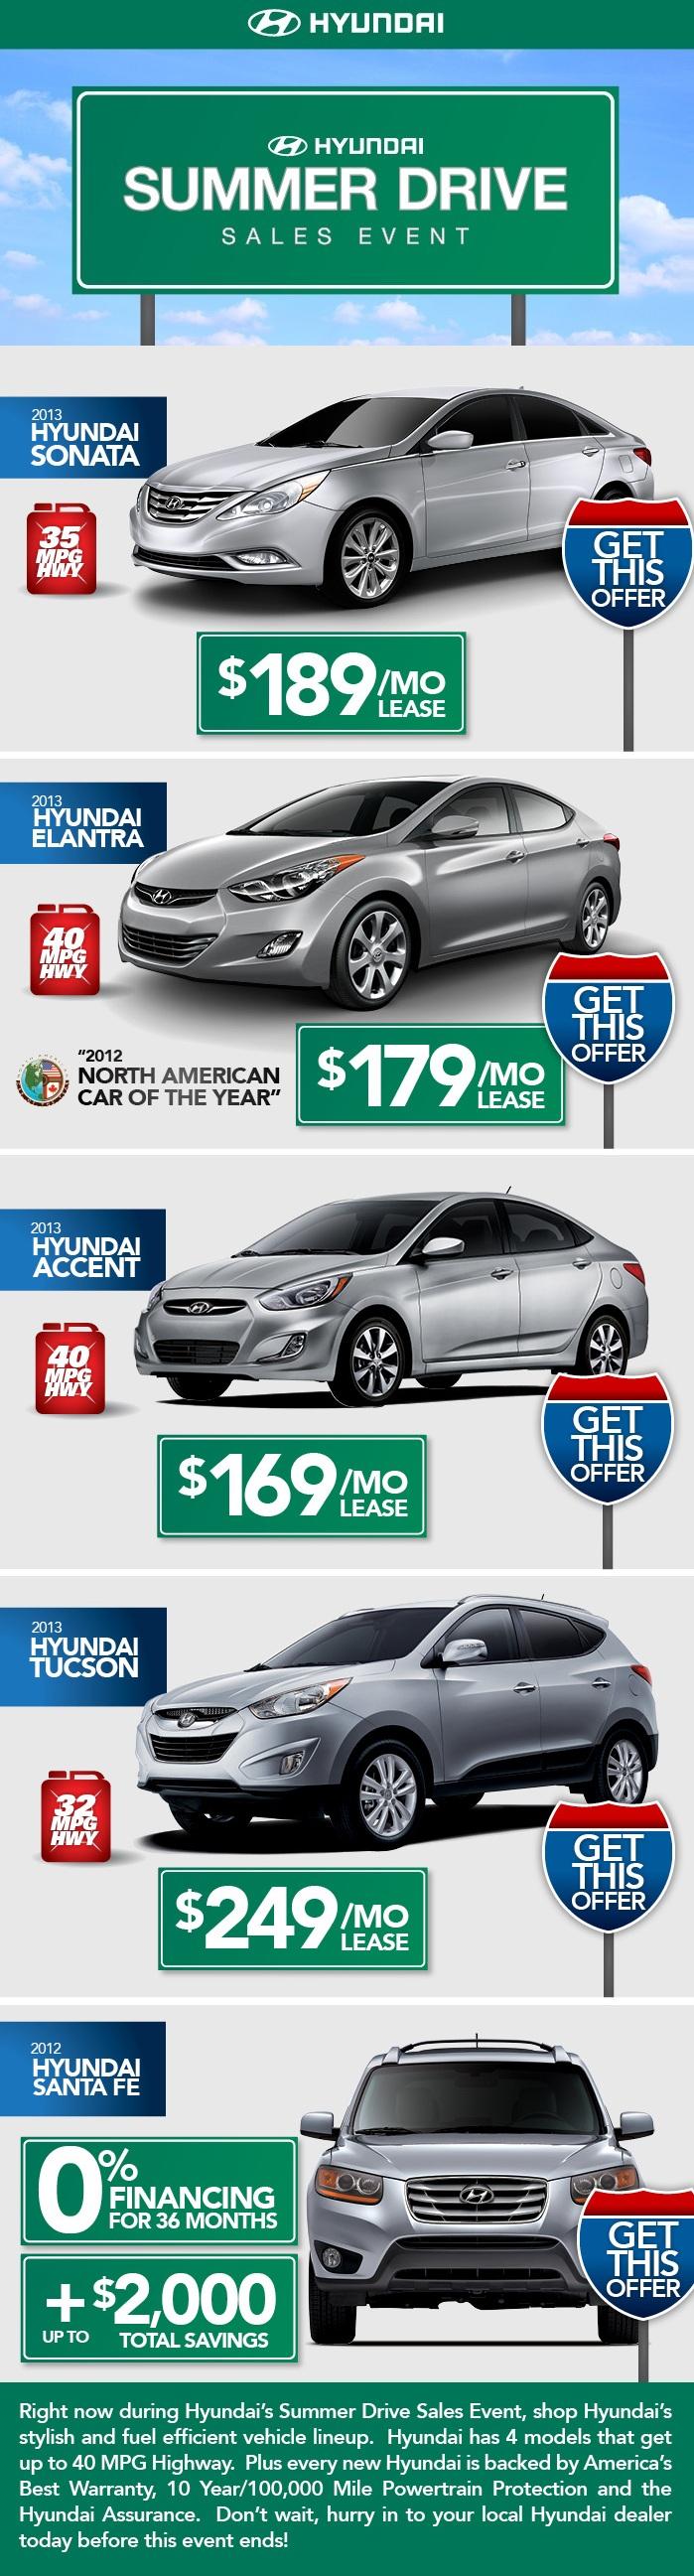 Hyundai Summer Sales Event Has Begun So Many Fuel Efficient Vehicles At Great Prices Elantra Hyundai College Park